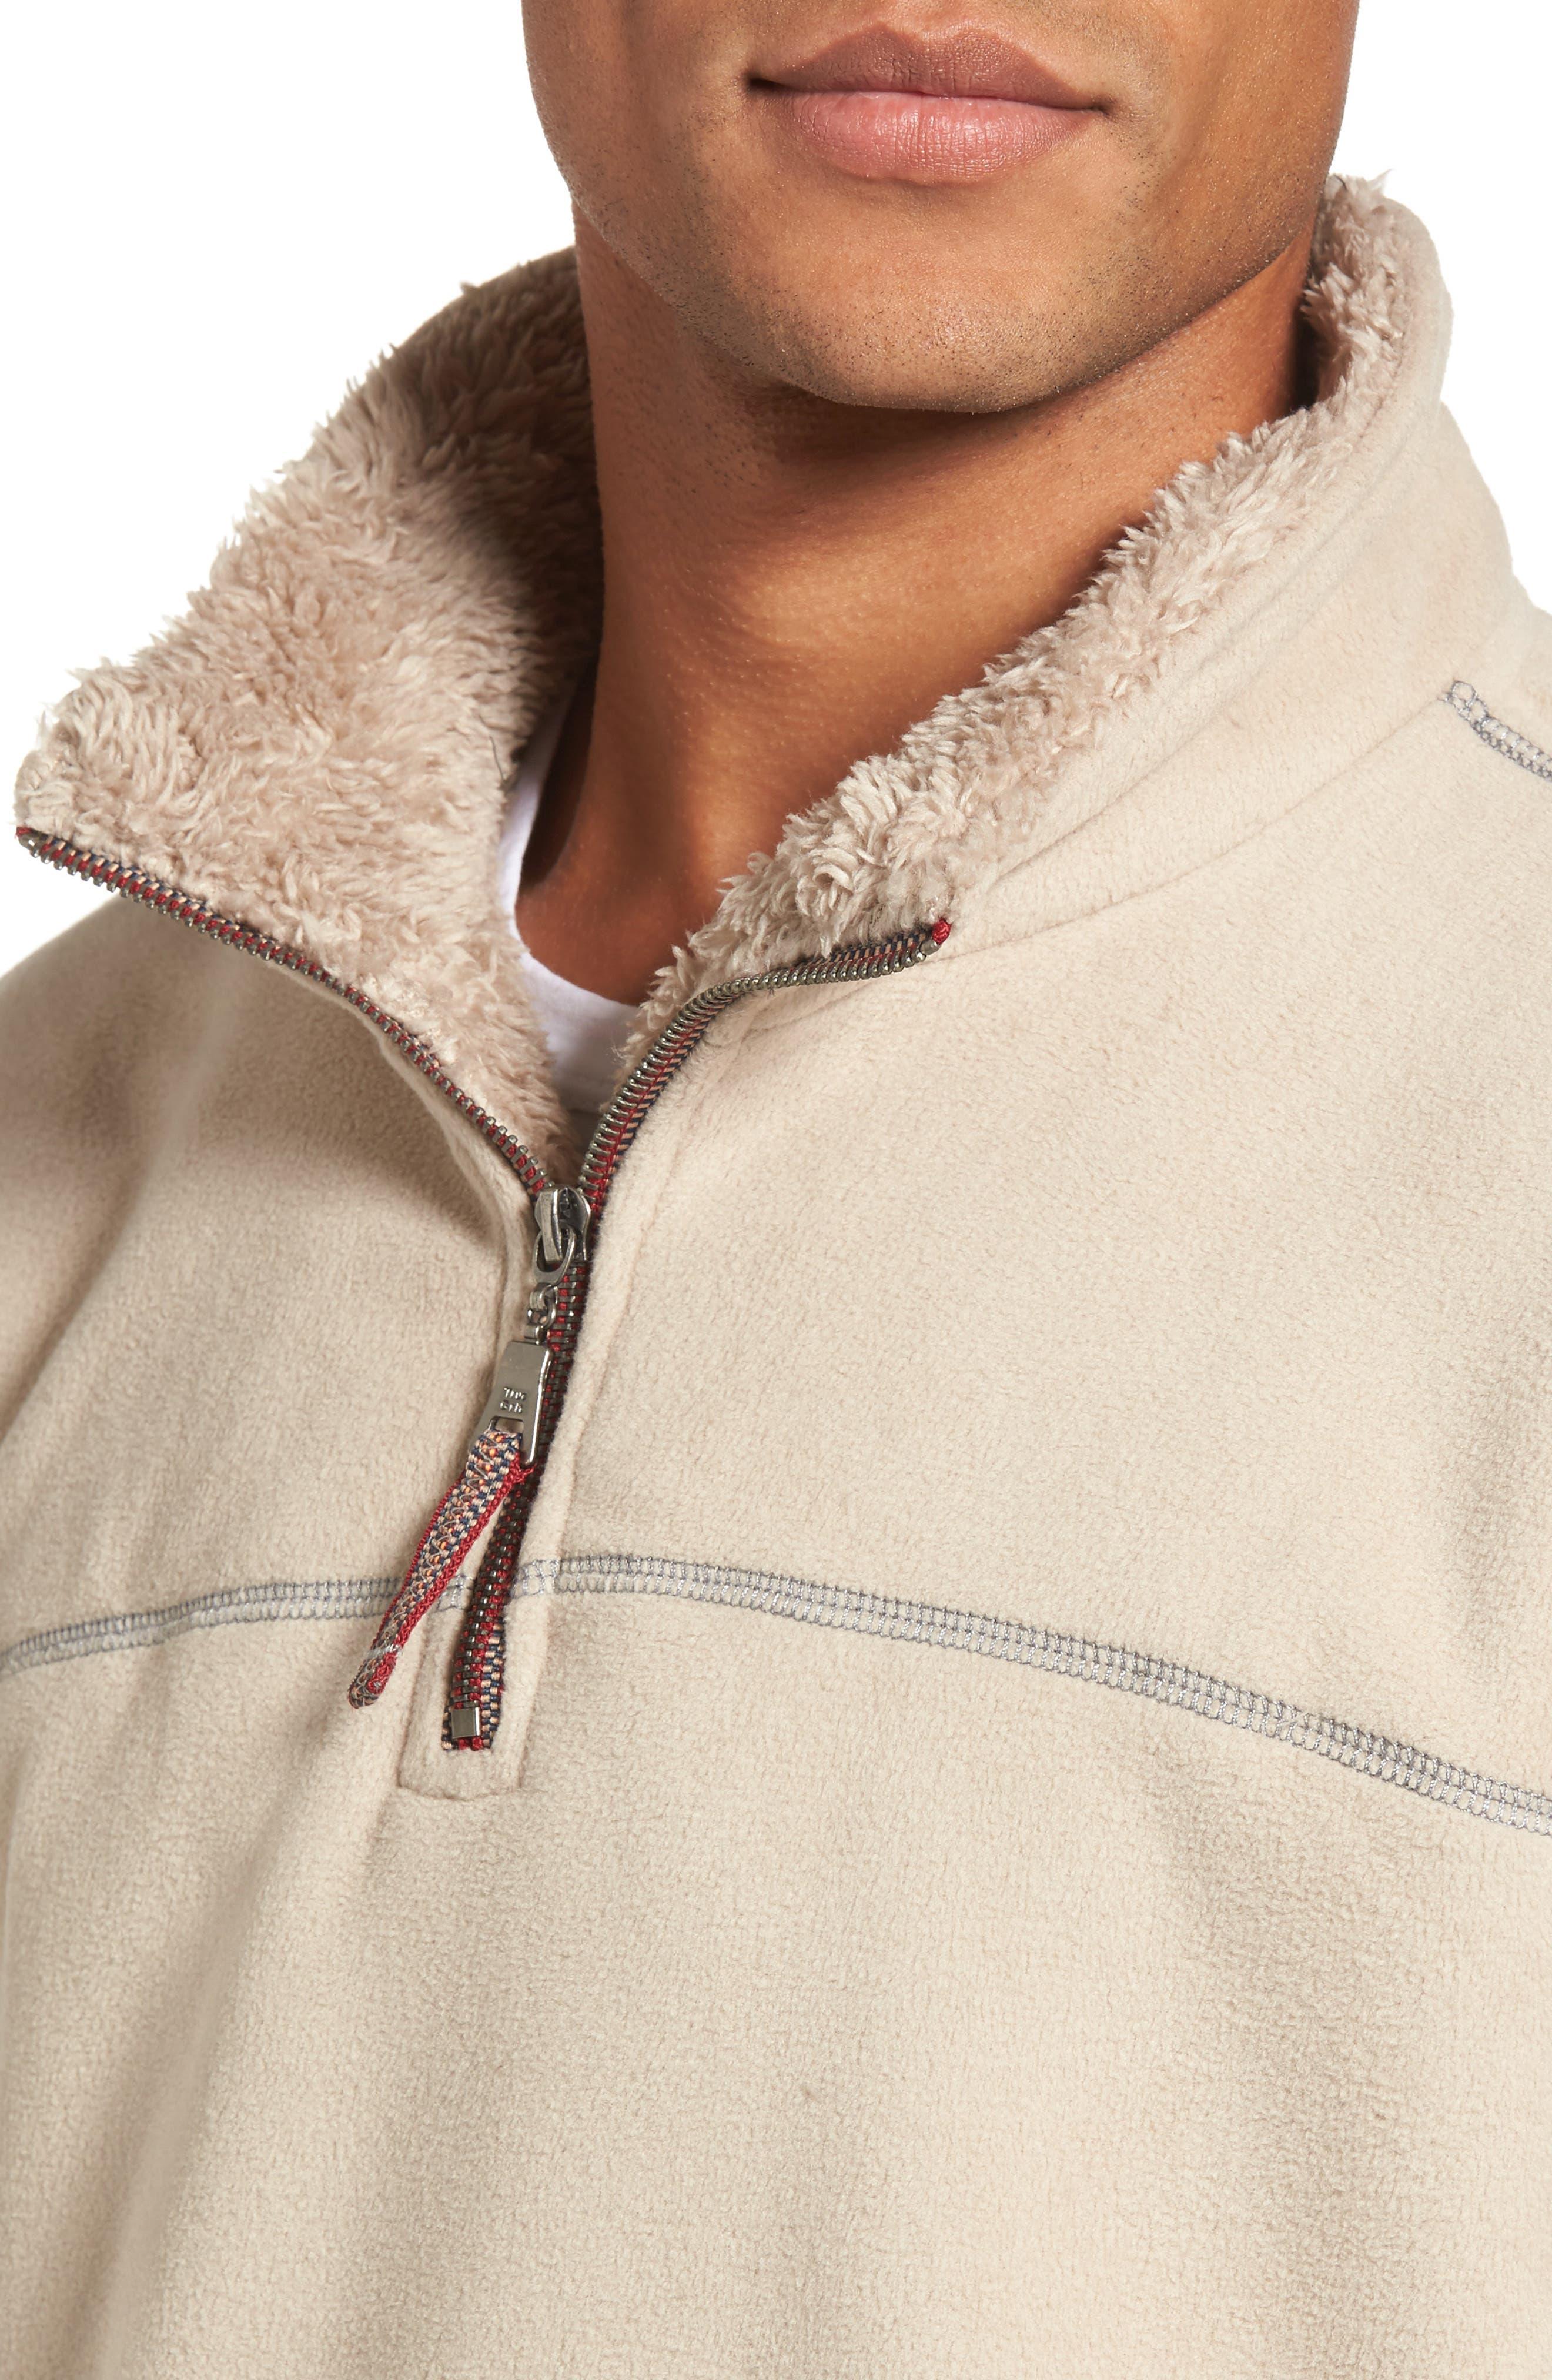 Bonded Polar Fleece Lined Pullover,                             Alternate thumbnail 4, color,                             249